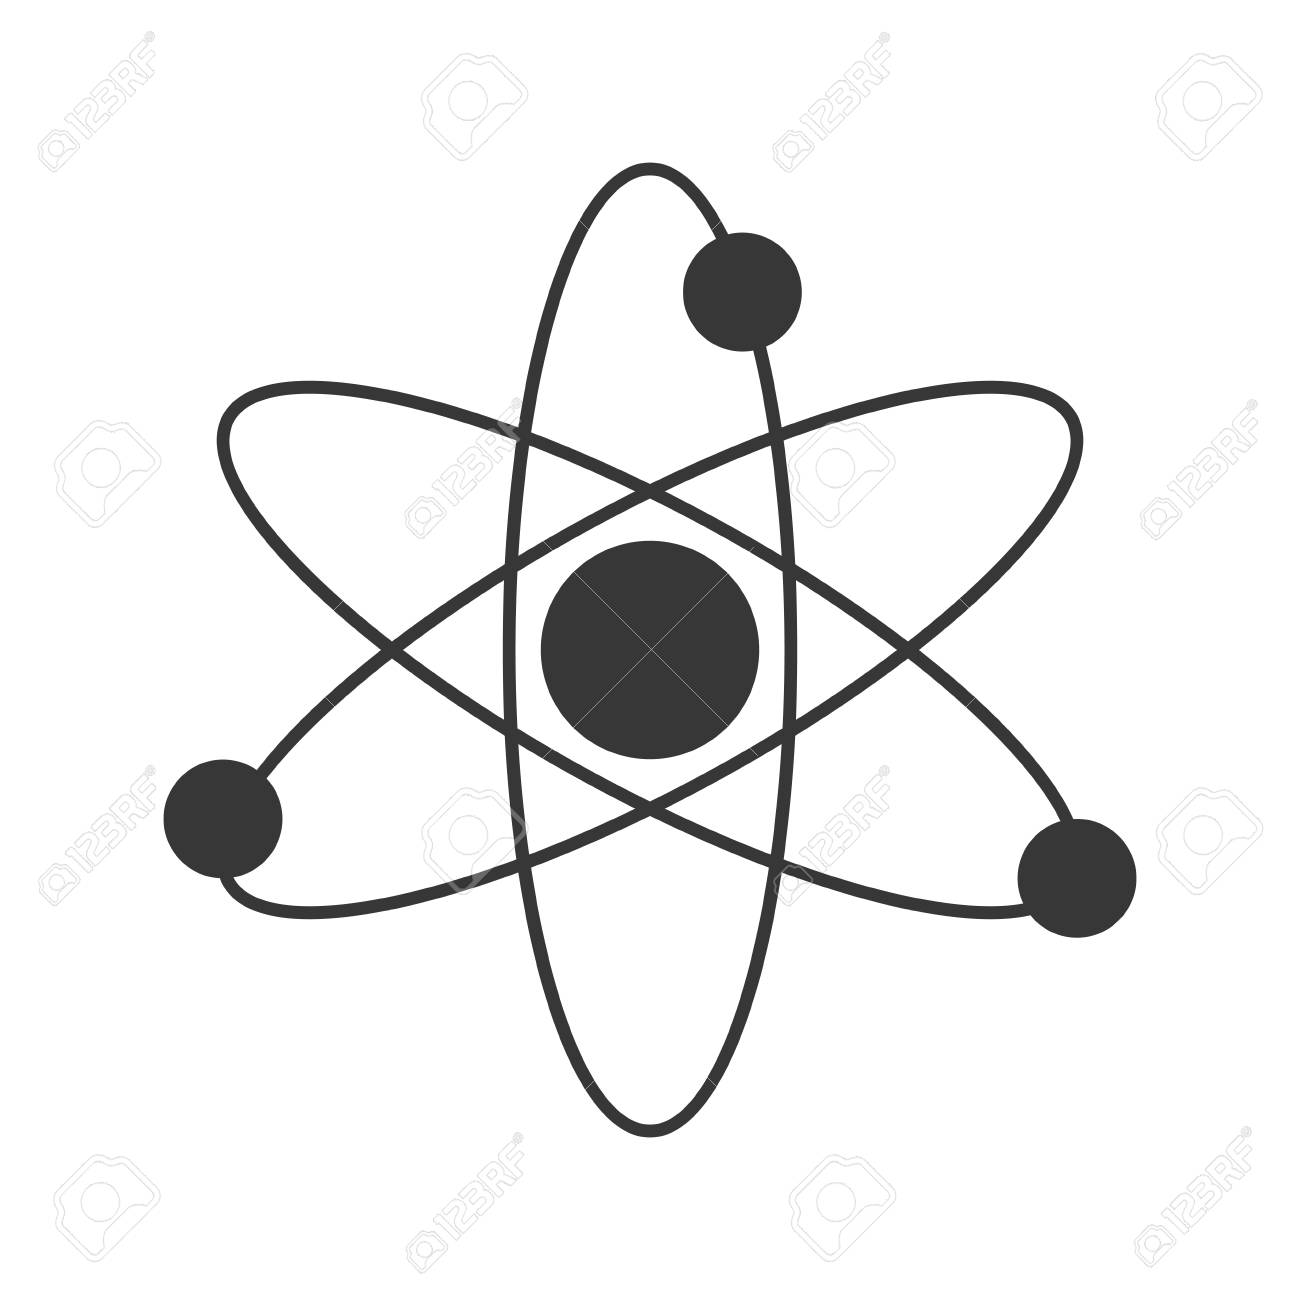 Flat design atom structure icon vector illustration royalty free flat design atom structure icon vector illustration stock vector 61800032 ccuart Images